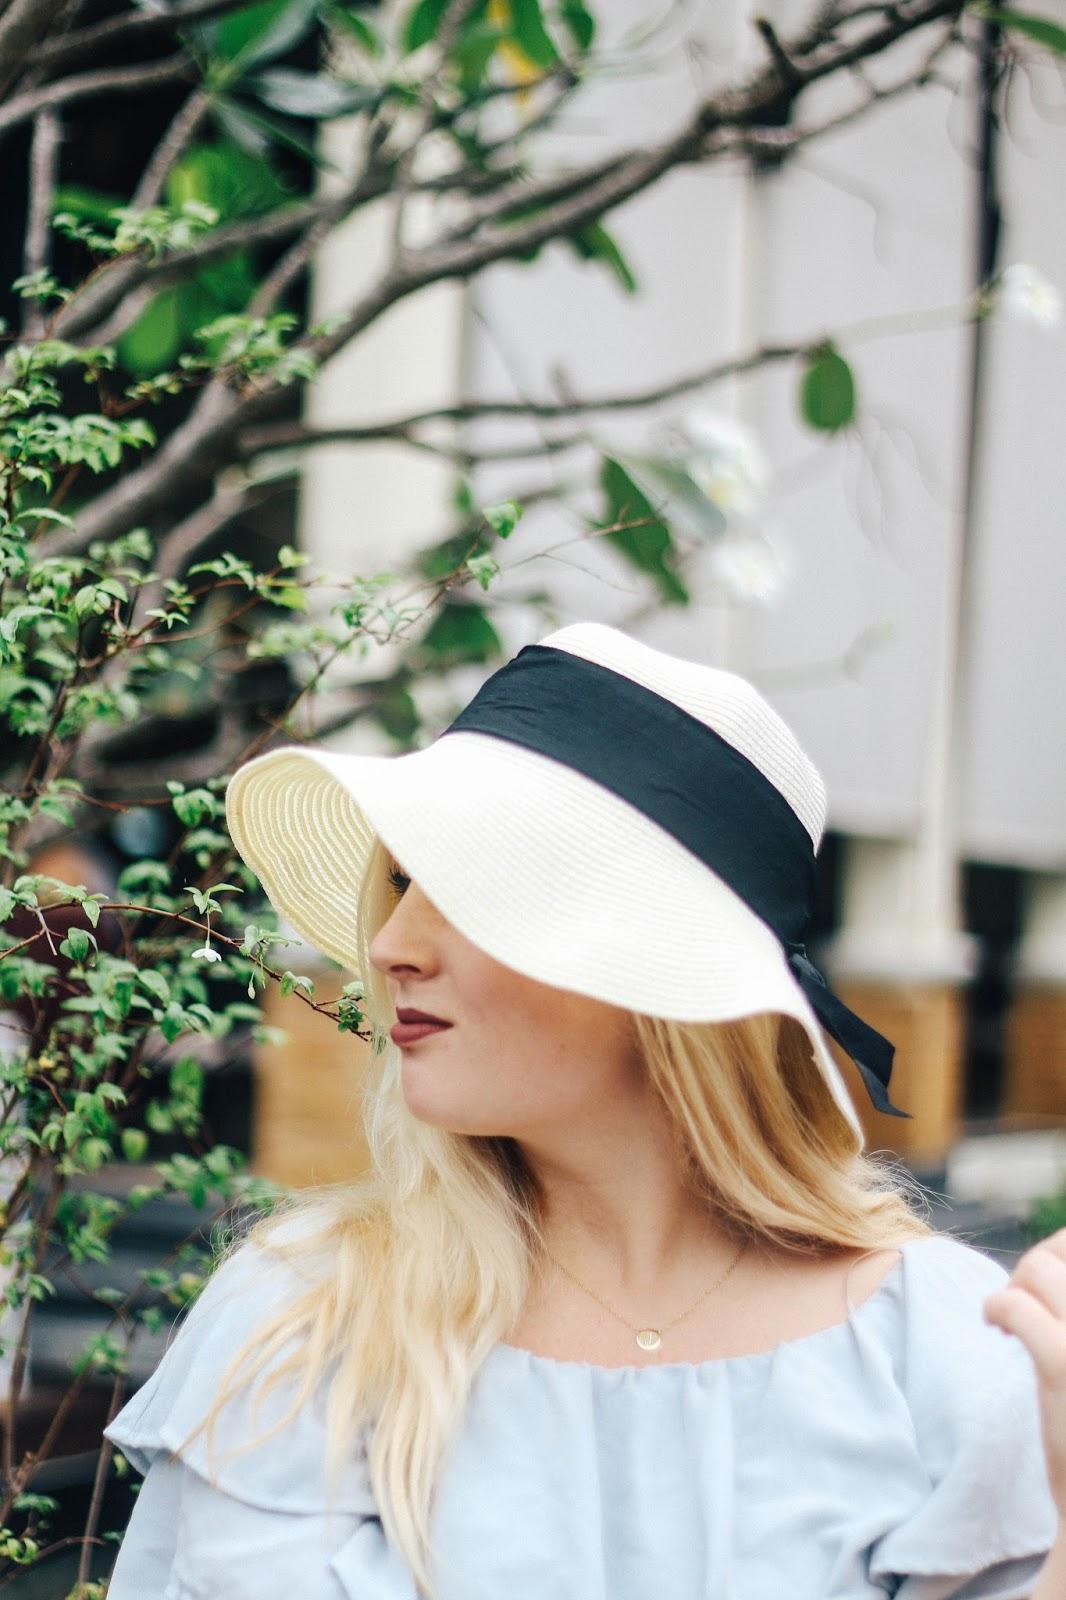 Fashion and Travel Blogger GlobalFashionGal (Brianna Degaston) wearing a floppy hat at Railay Beach, Thailand.